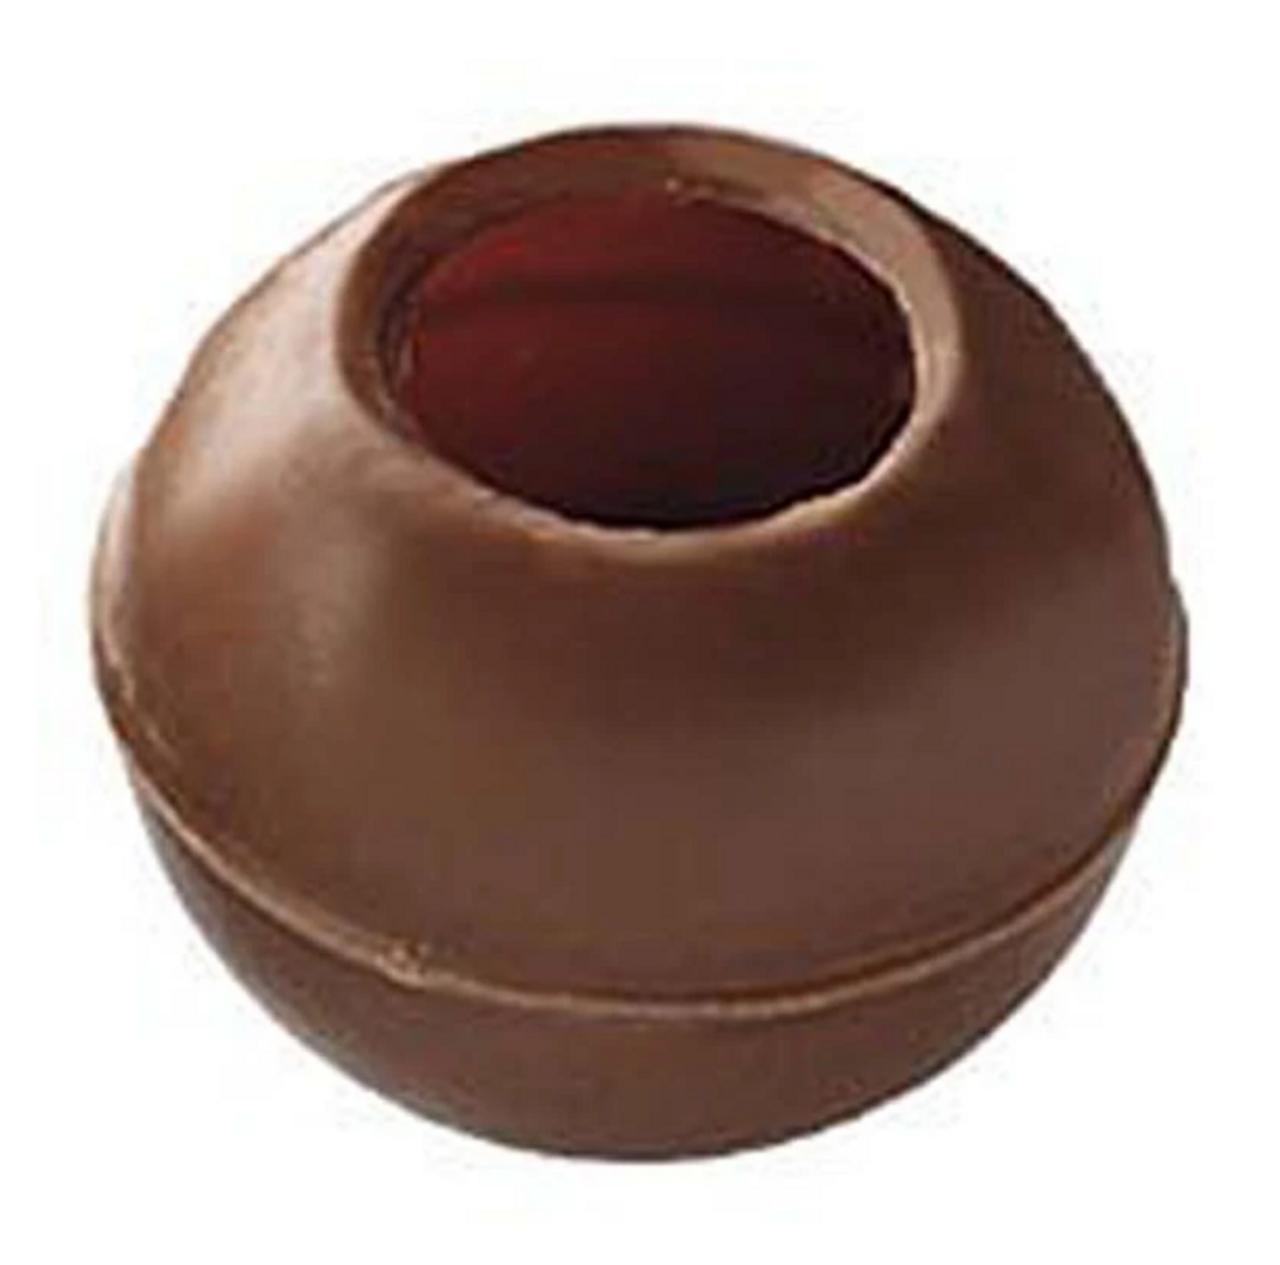 CALLEBAUT MILK CHOCOLATE TRUFFLE SHELLS x 504 pcs